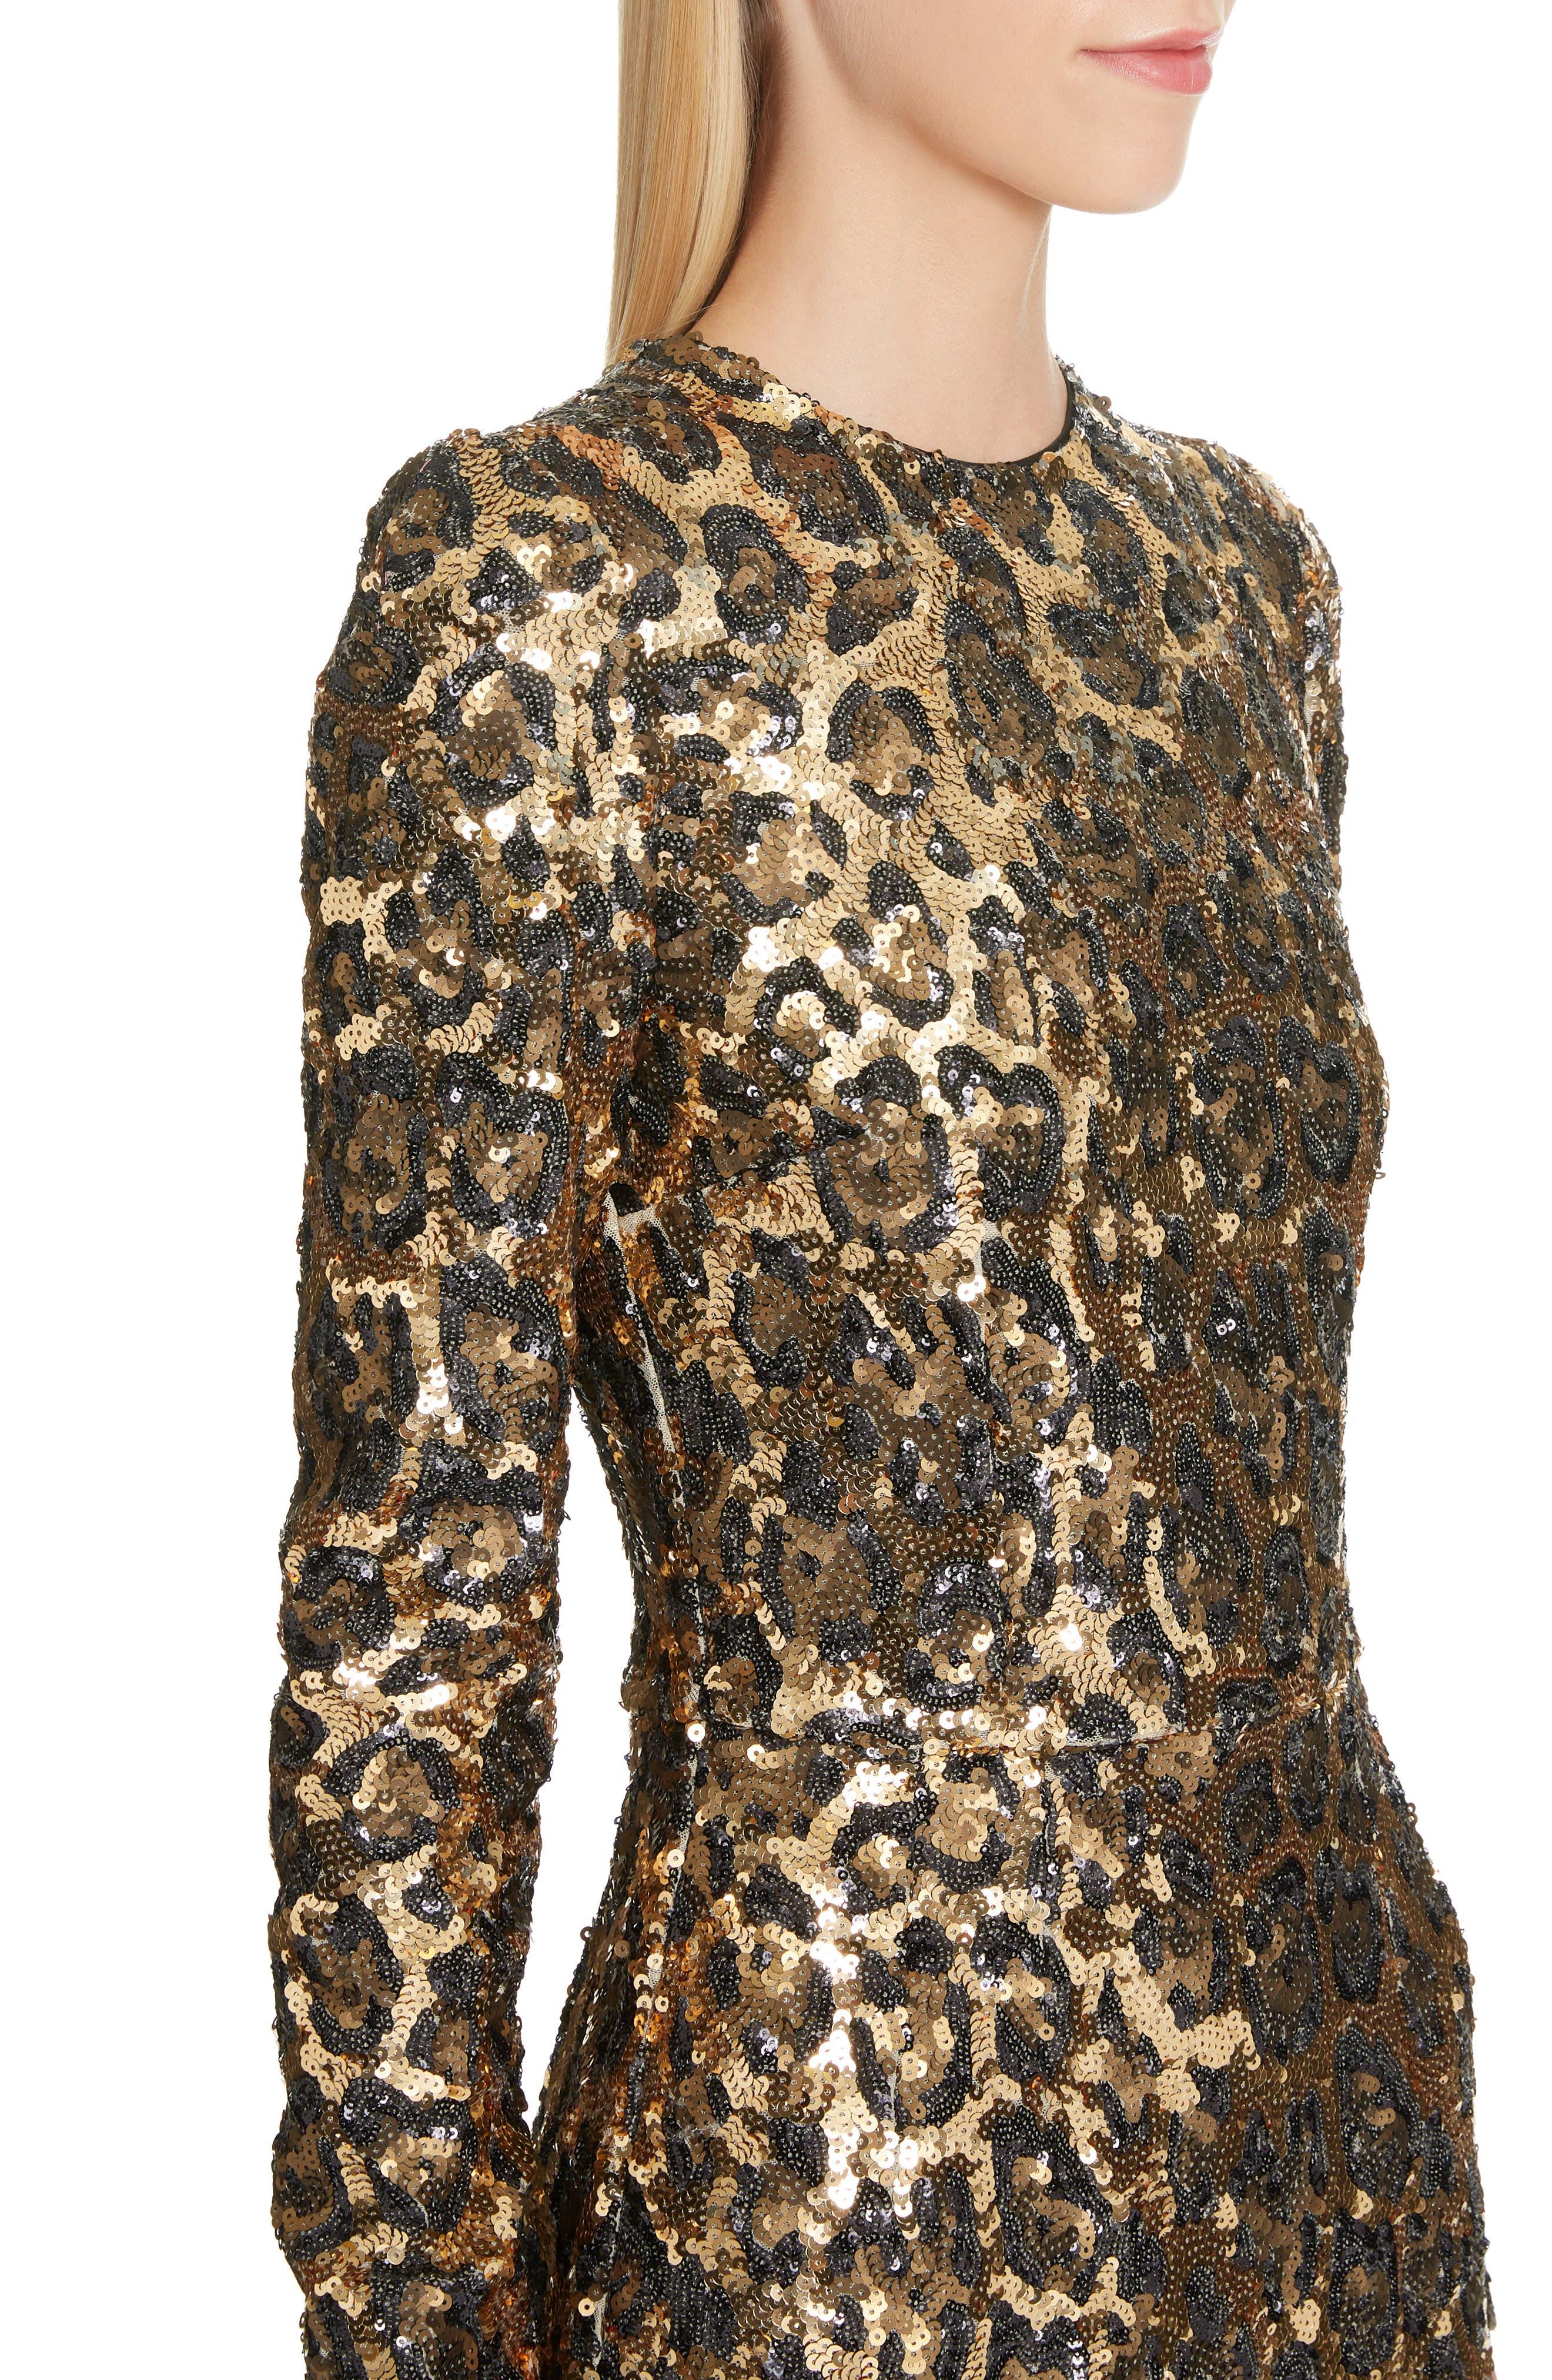 Sequin Leopard Print Sheath Dress,                             Alternate thumbnail 4, color,                             S0905 LEO